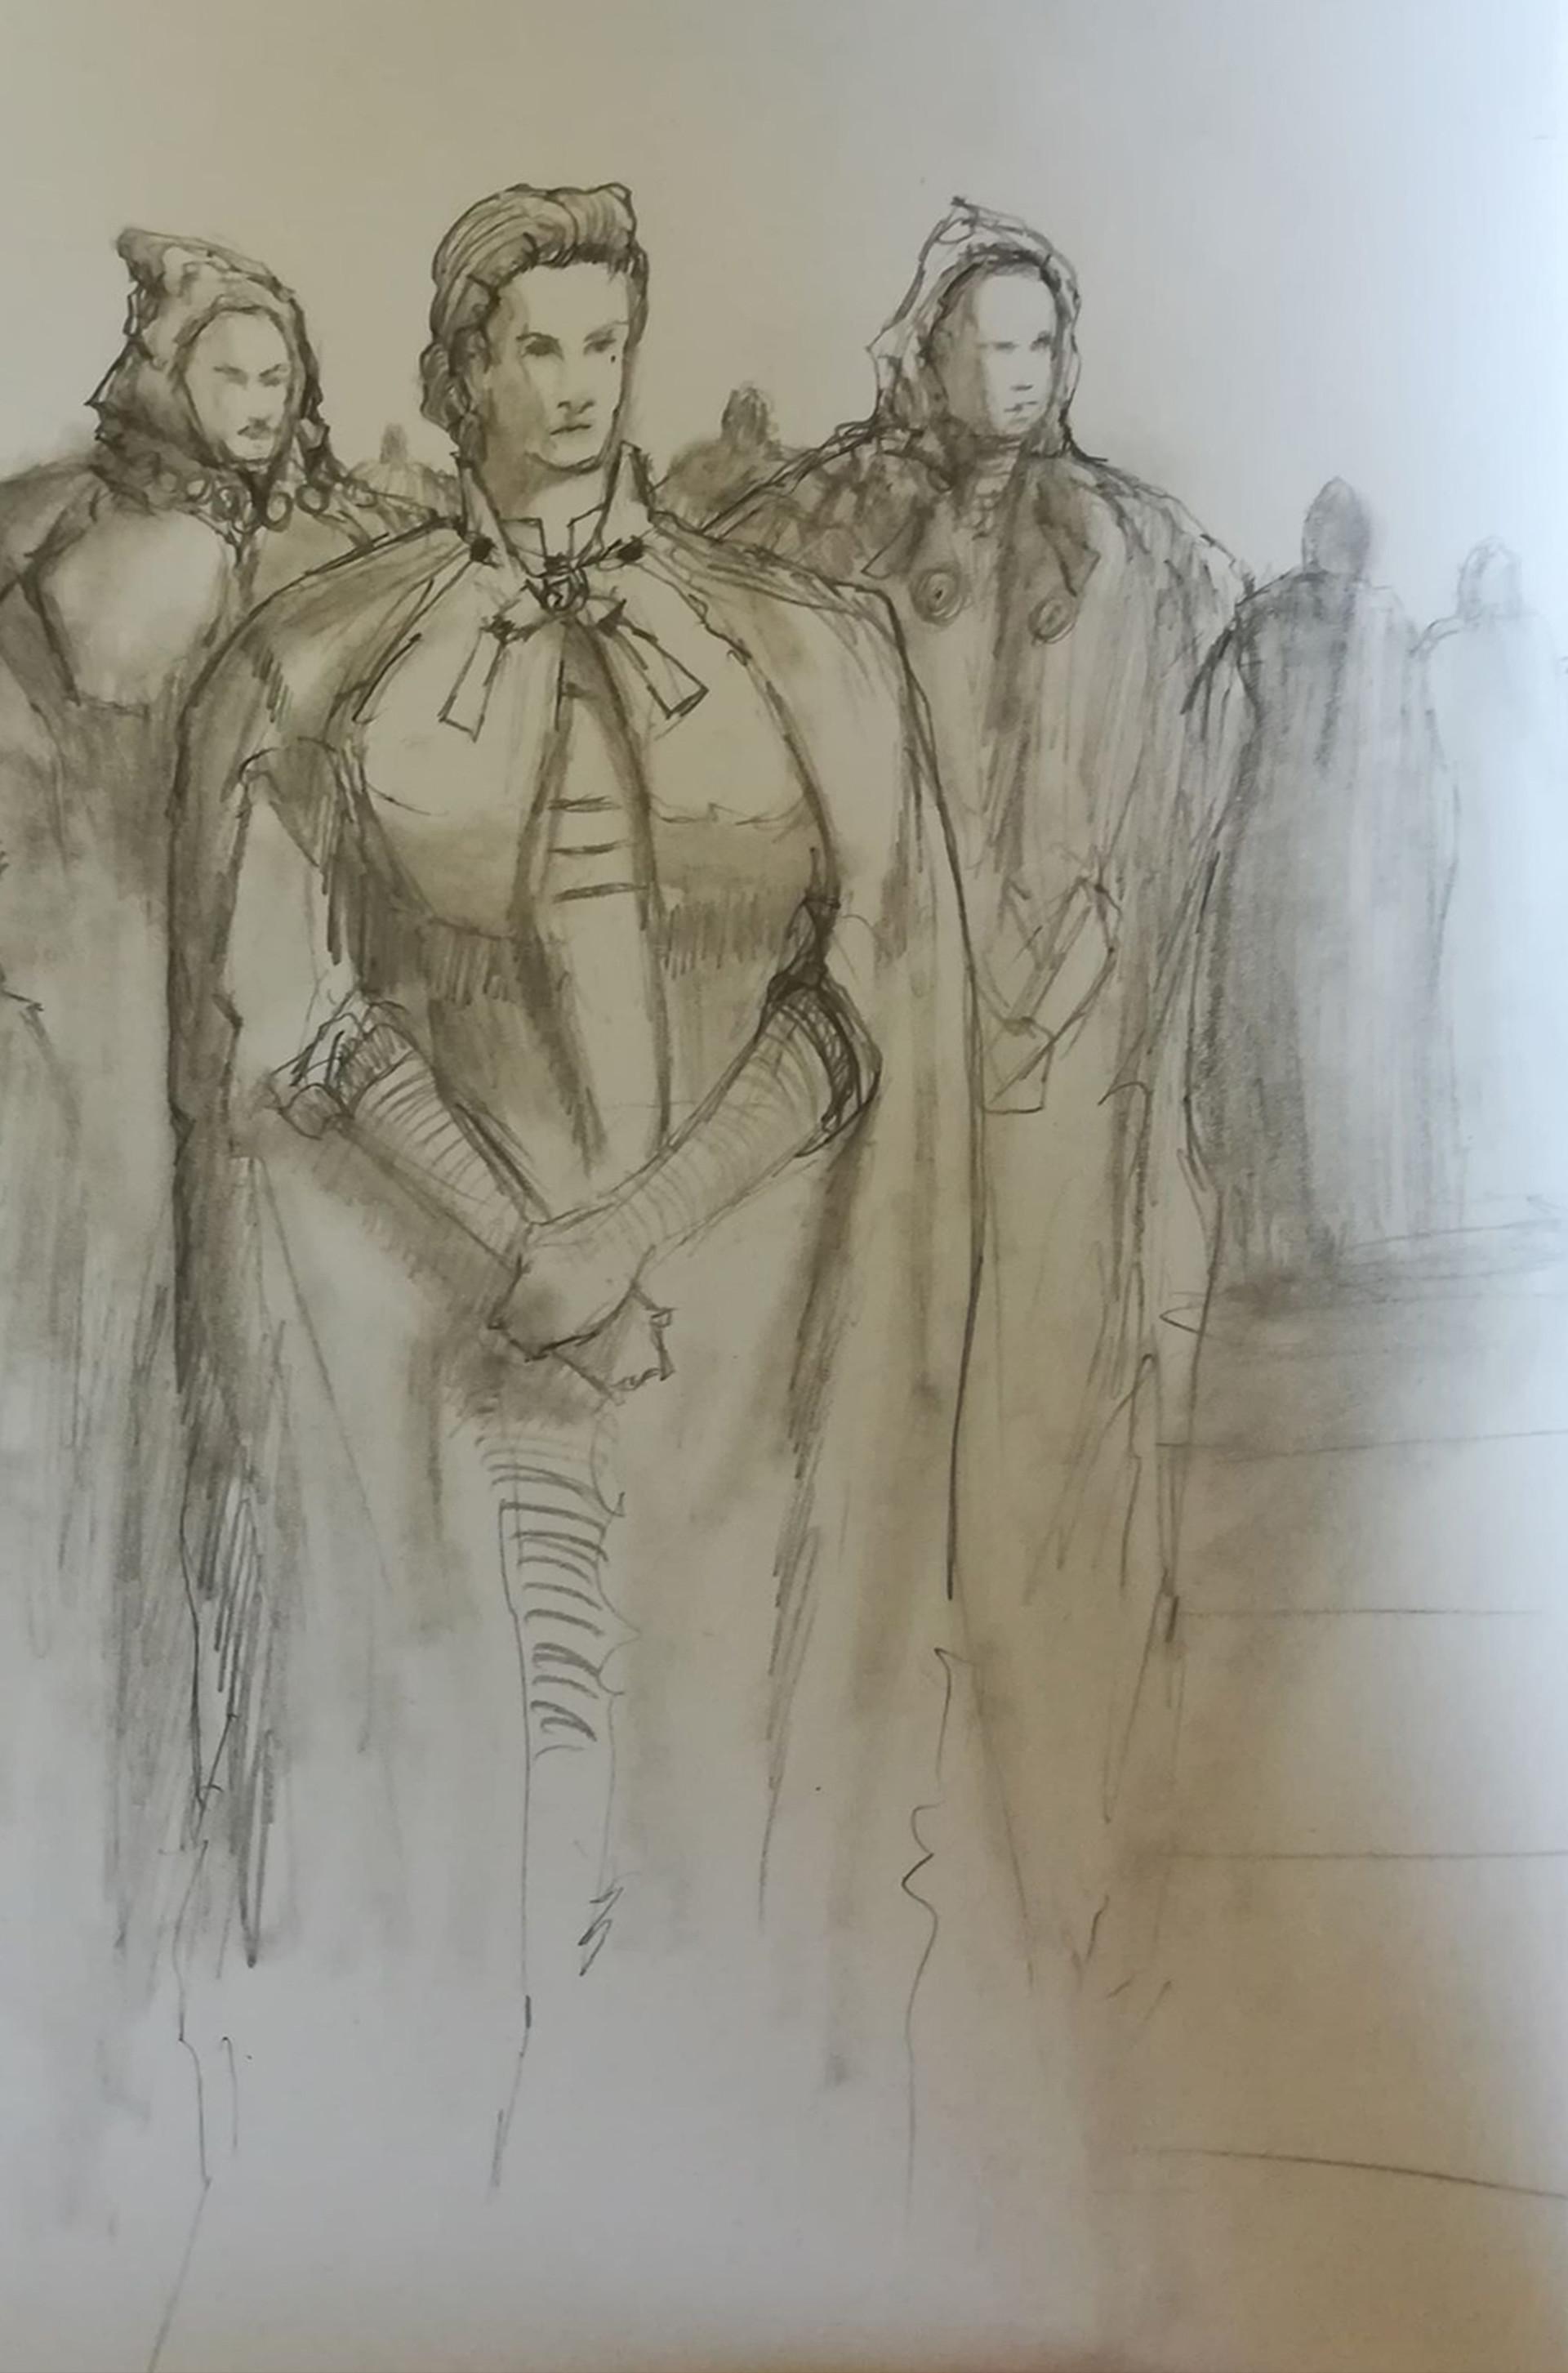 David tilton sketch